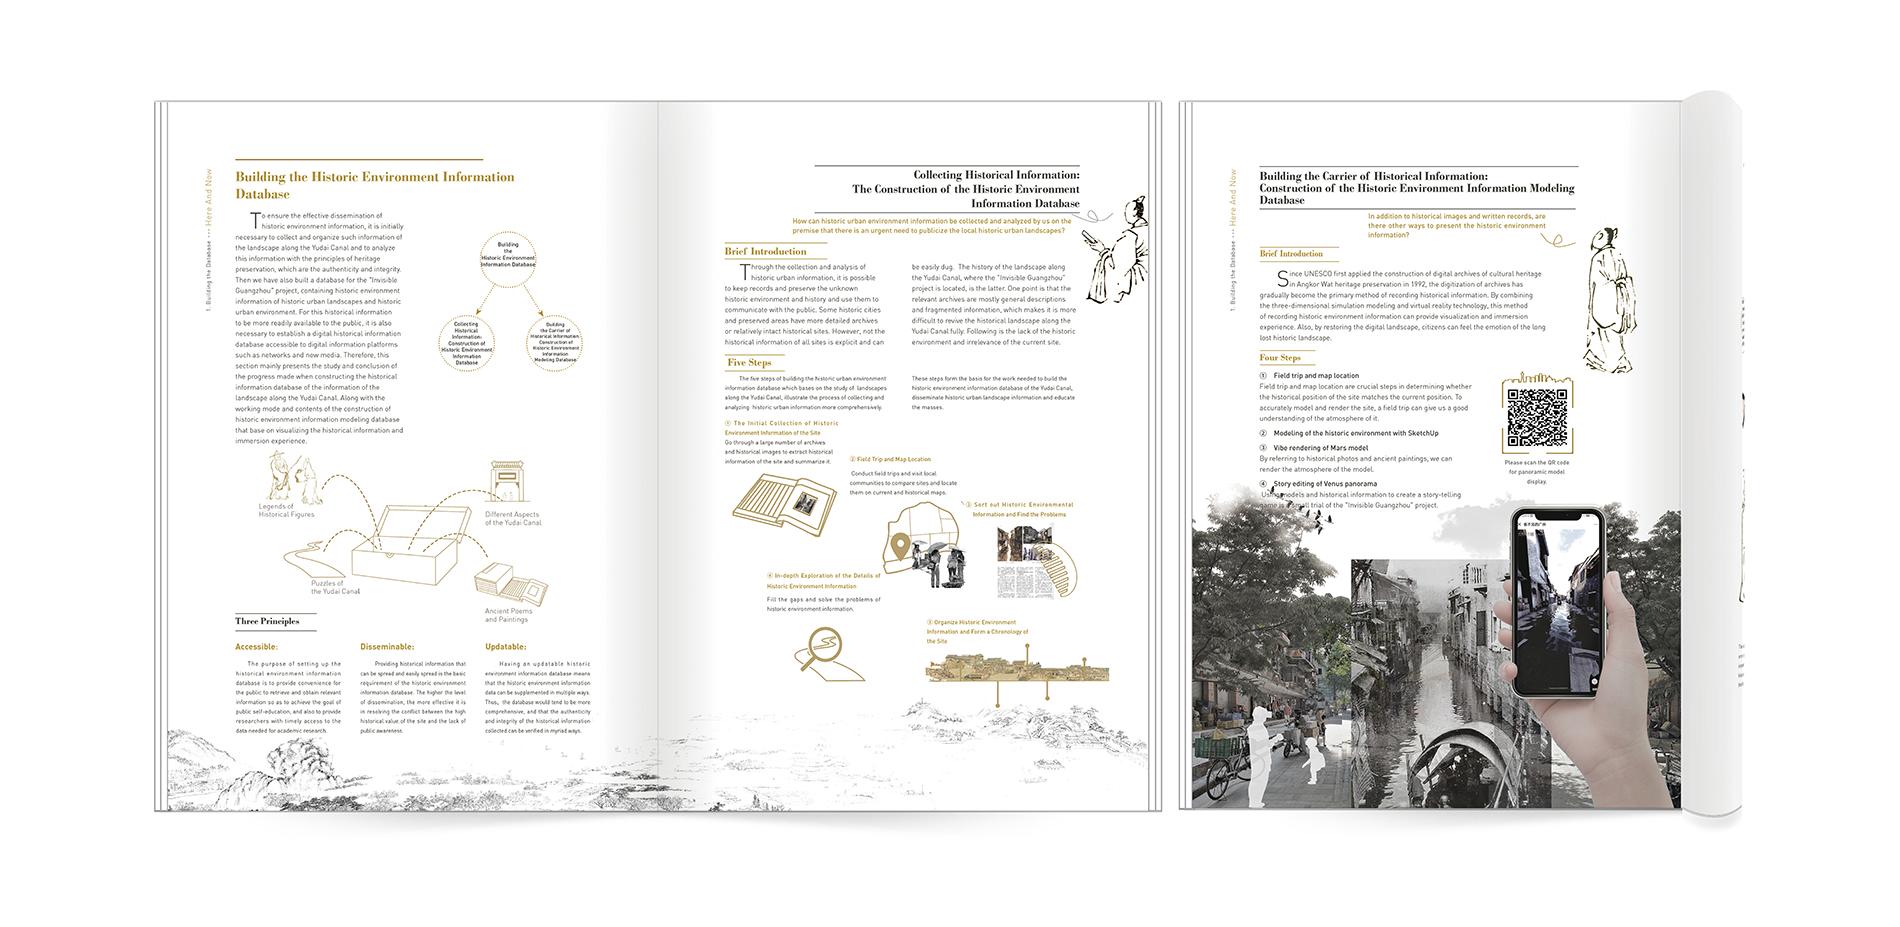 Building Historic Urban Environment Information Database